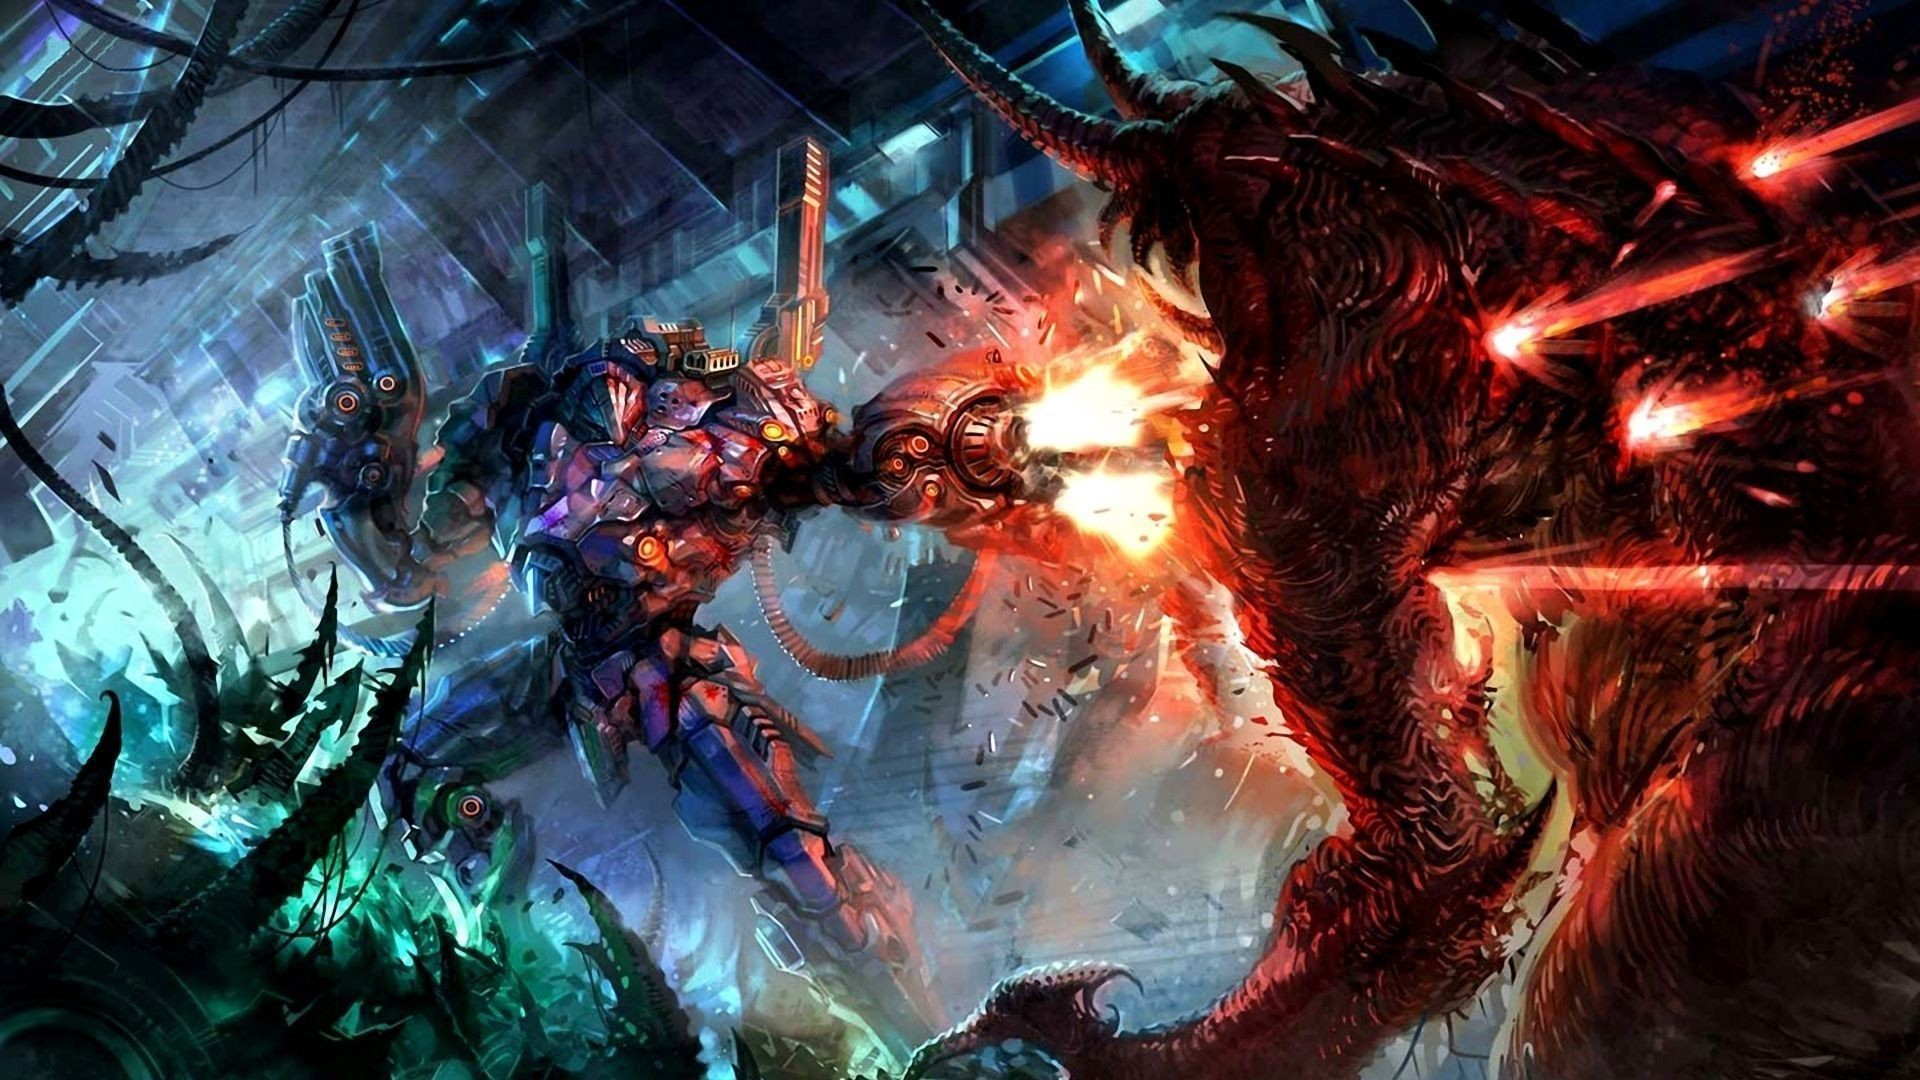 artwork, Fantasy Art, Concept Art, Robot, Demon, Mech Wallpapers HD /  Desktop and Mobile Backgrounds